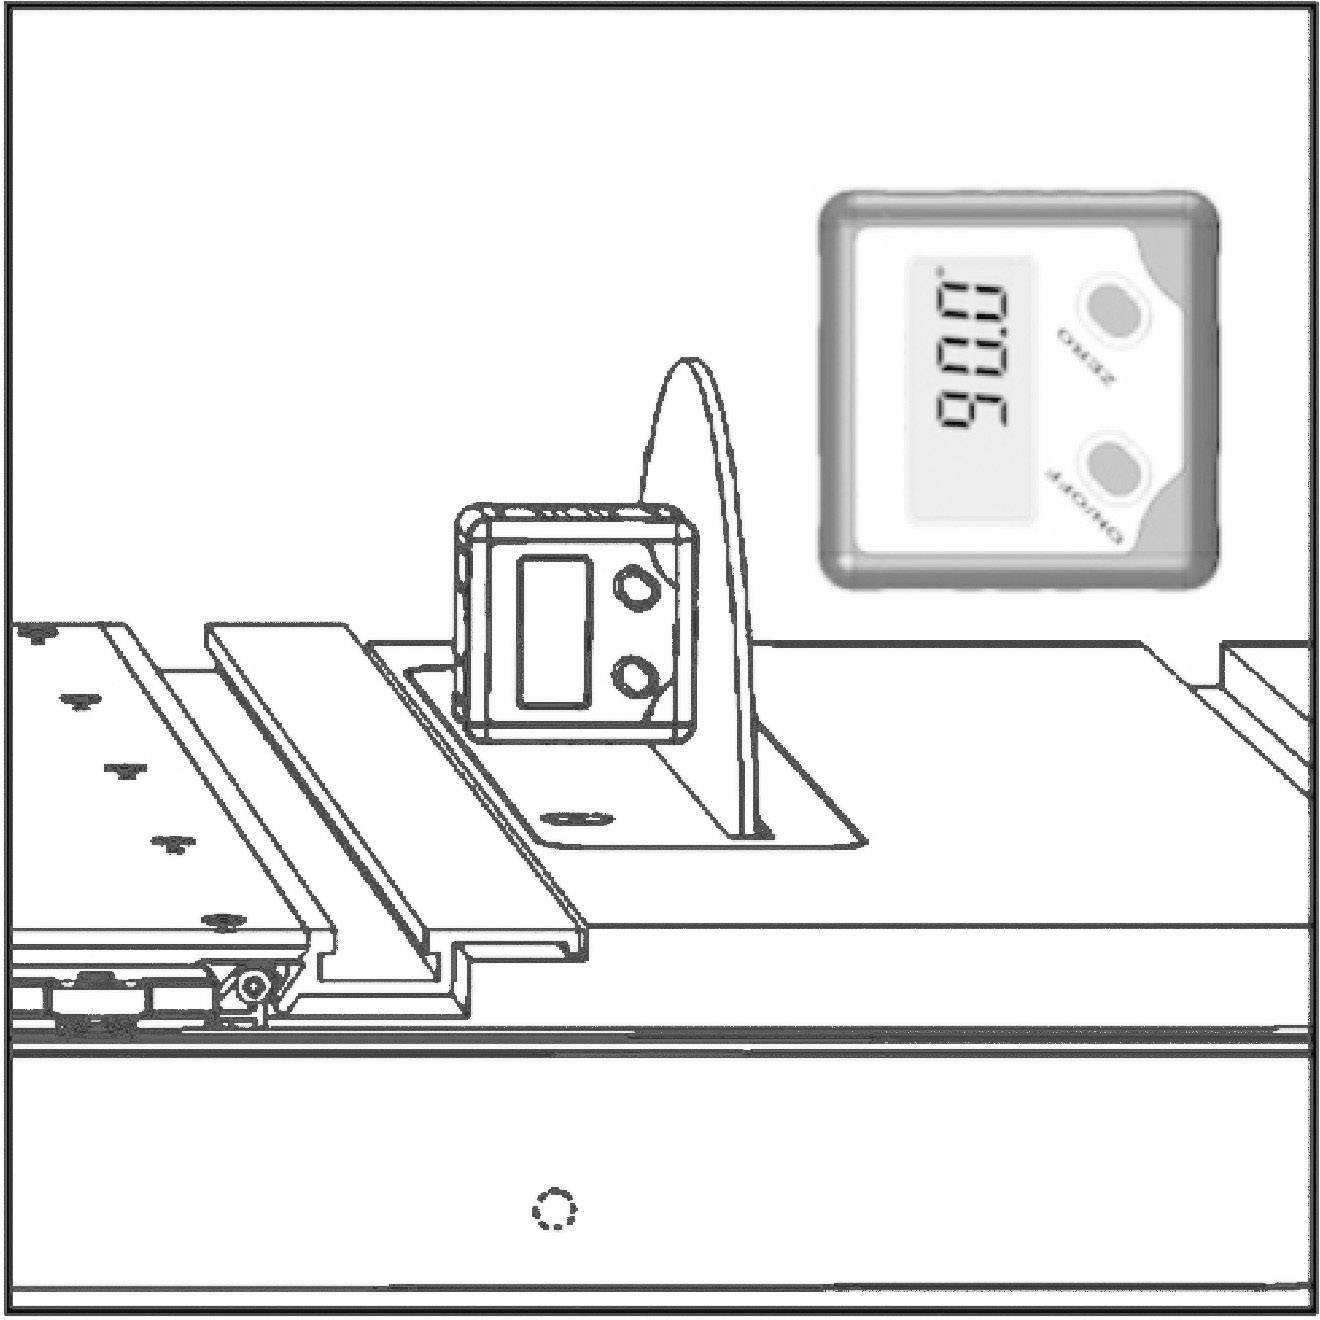 Elektronický uhlomer Toolcraft, 5 x 5 cm